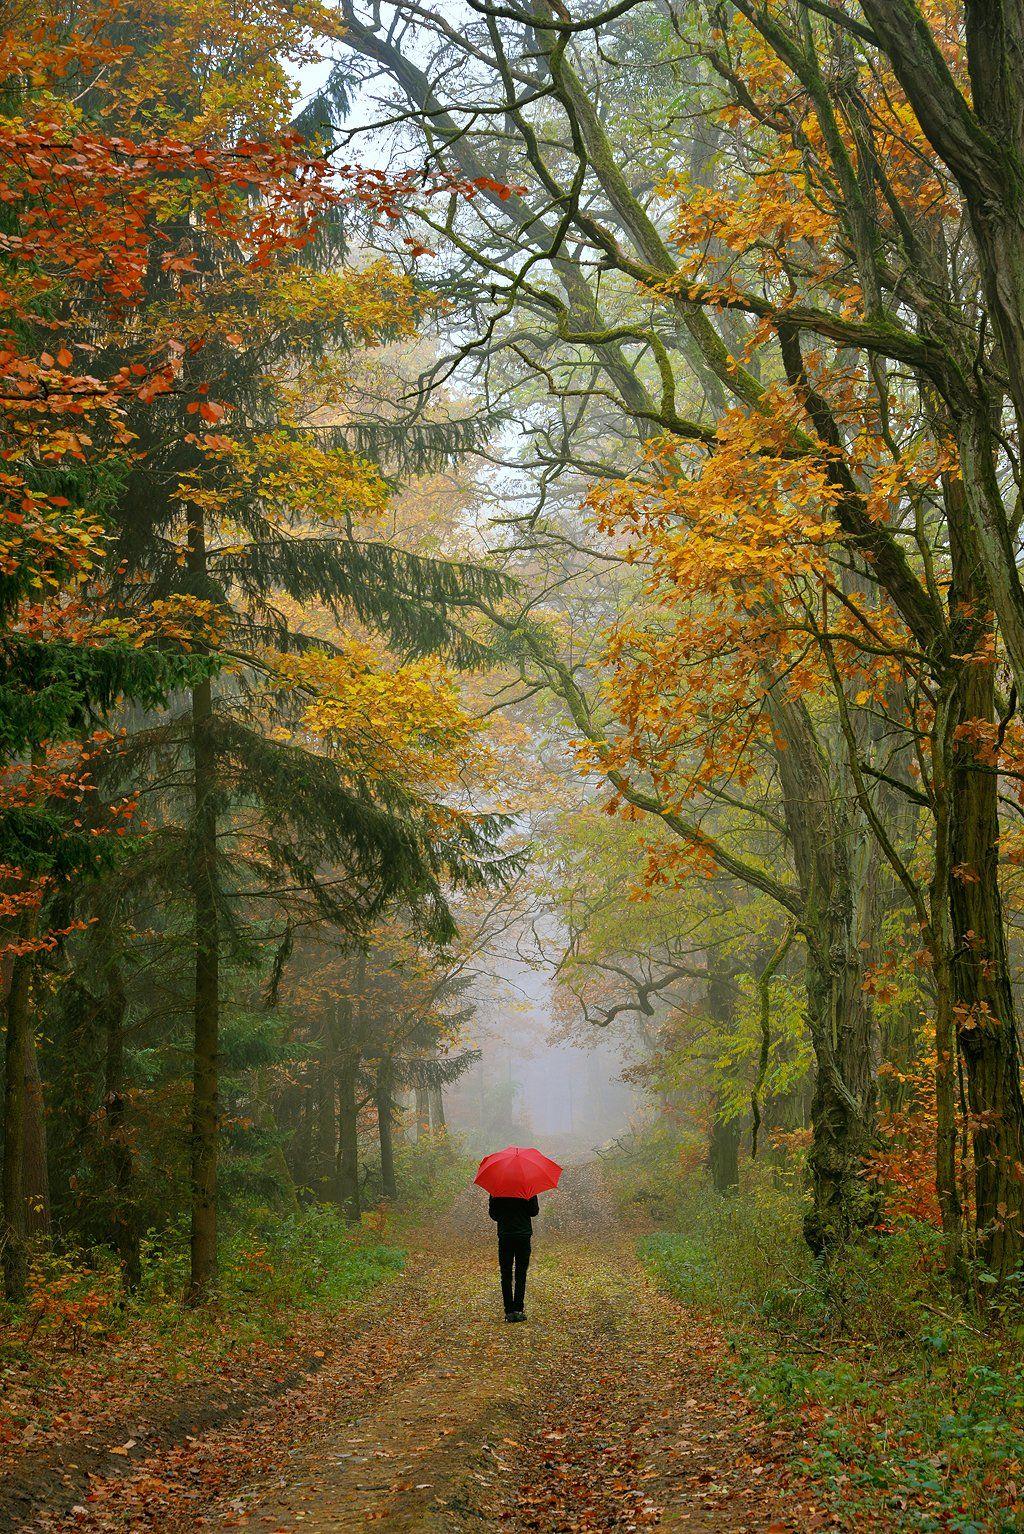 autumn walk fall magic trees path mist foggy dranikowski forest alone, Radoslaw Dranikowski